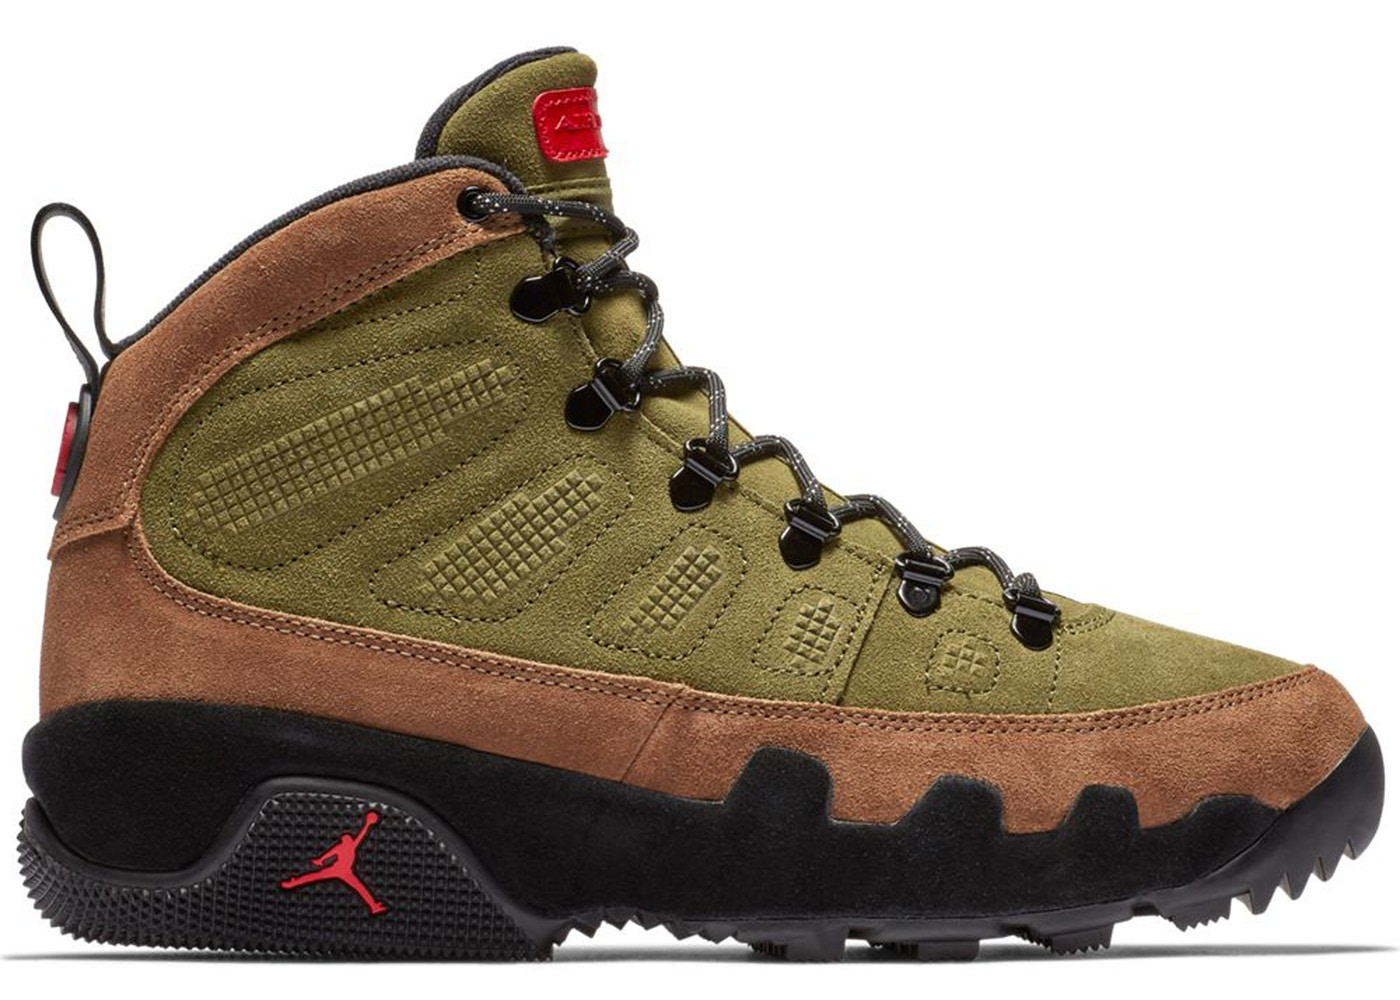 7e5c800cea8 Jordan 9 Retro Boot Military Brown - AR4491-200